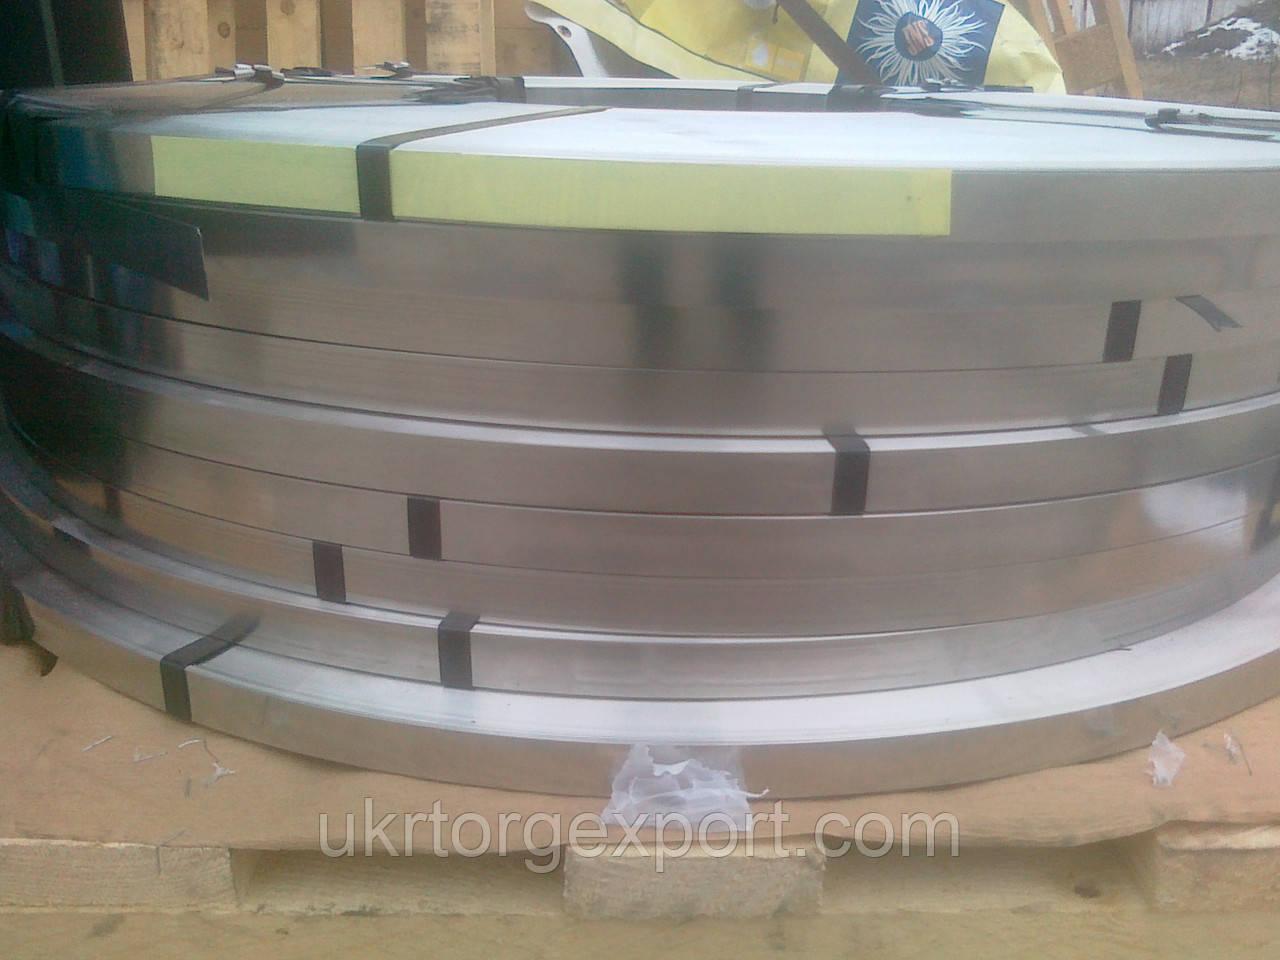 Лента фехраль Х23Ю5Т (OCr23Al5) 0,8*8,0 мм